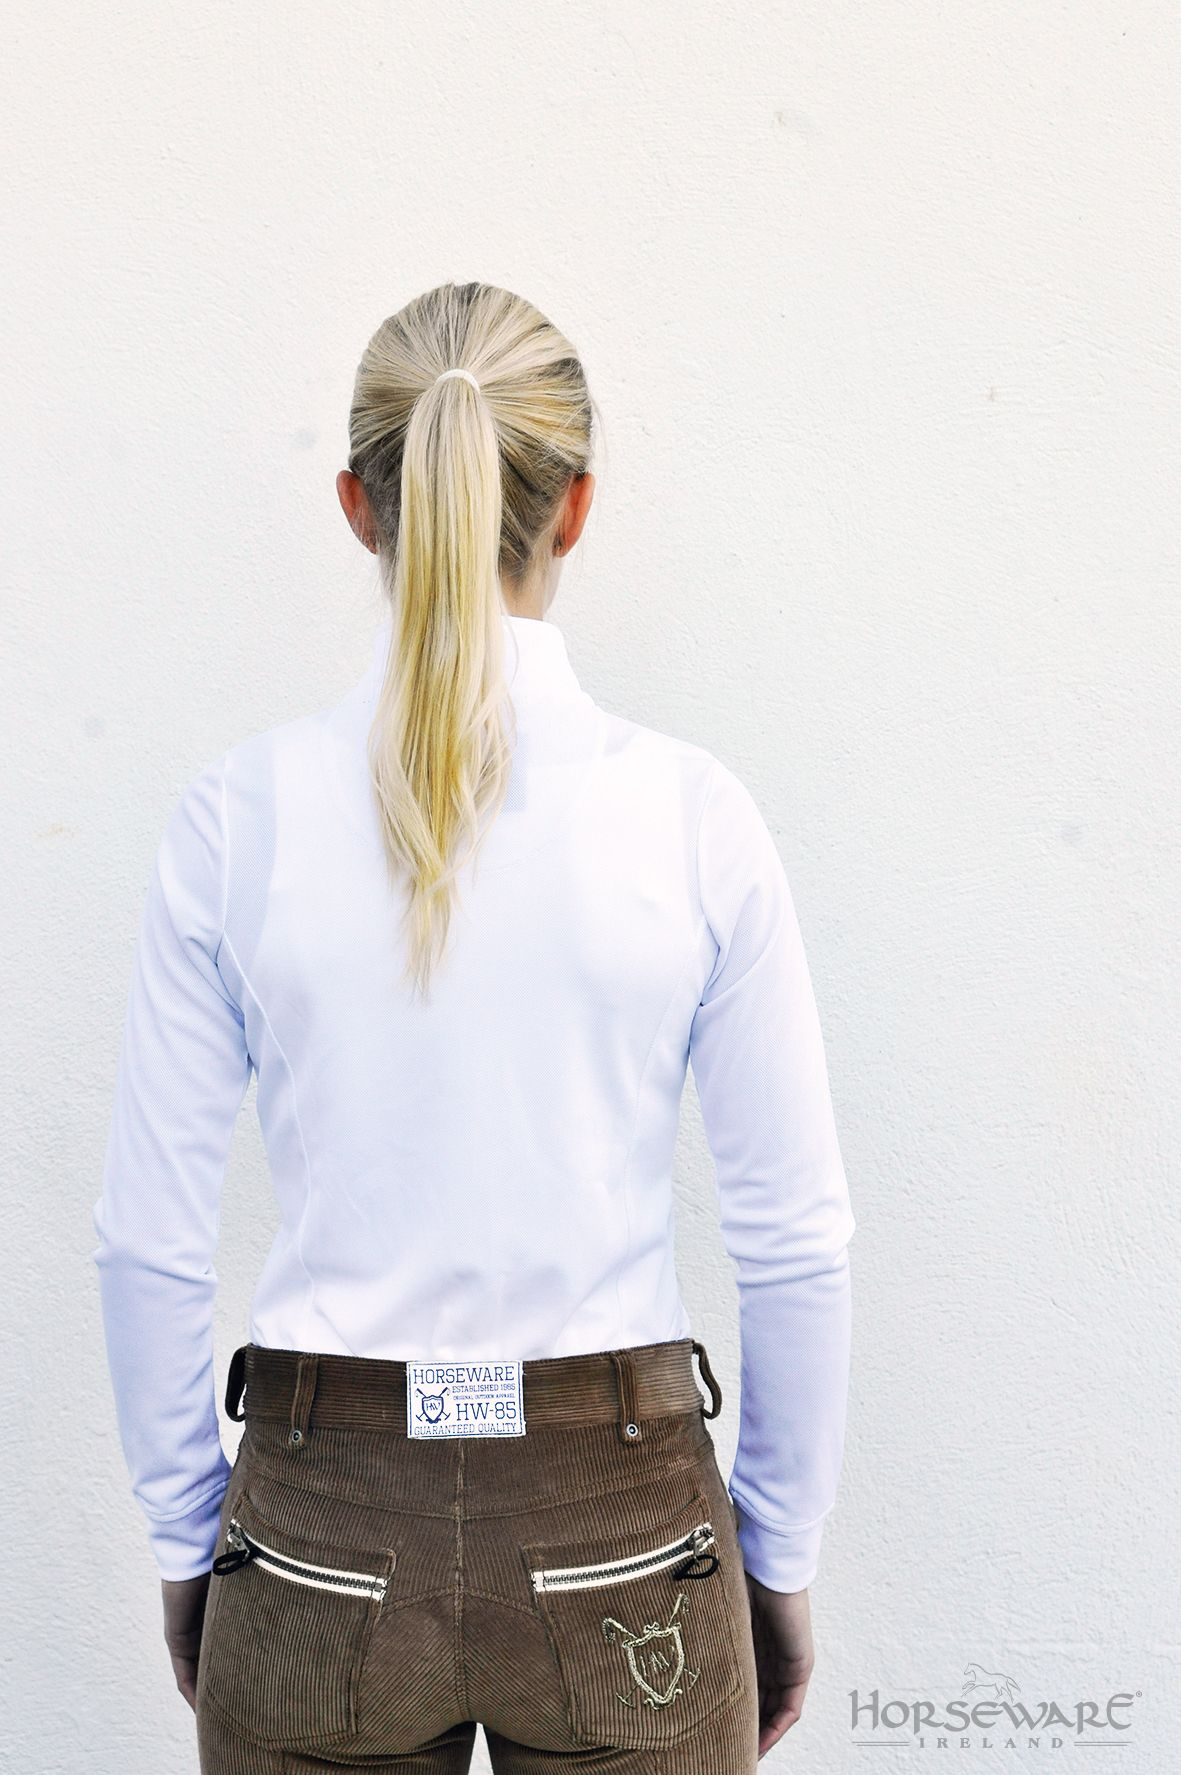 Horseware Polo Collection A W15 Elena Long Sleeve